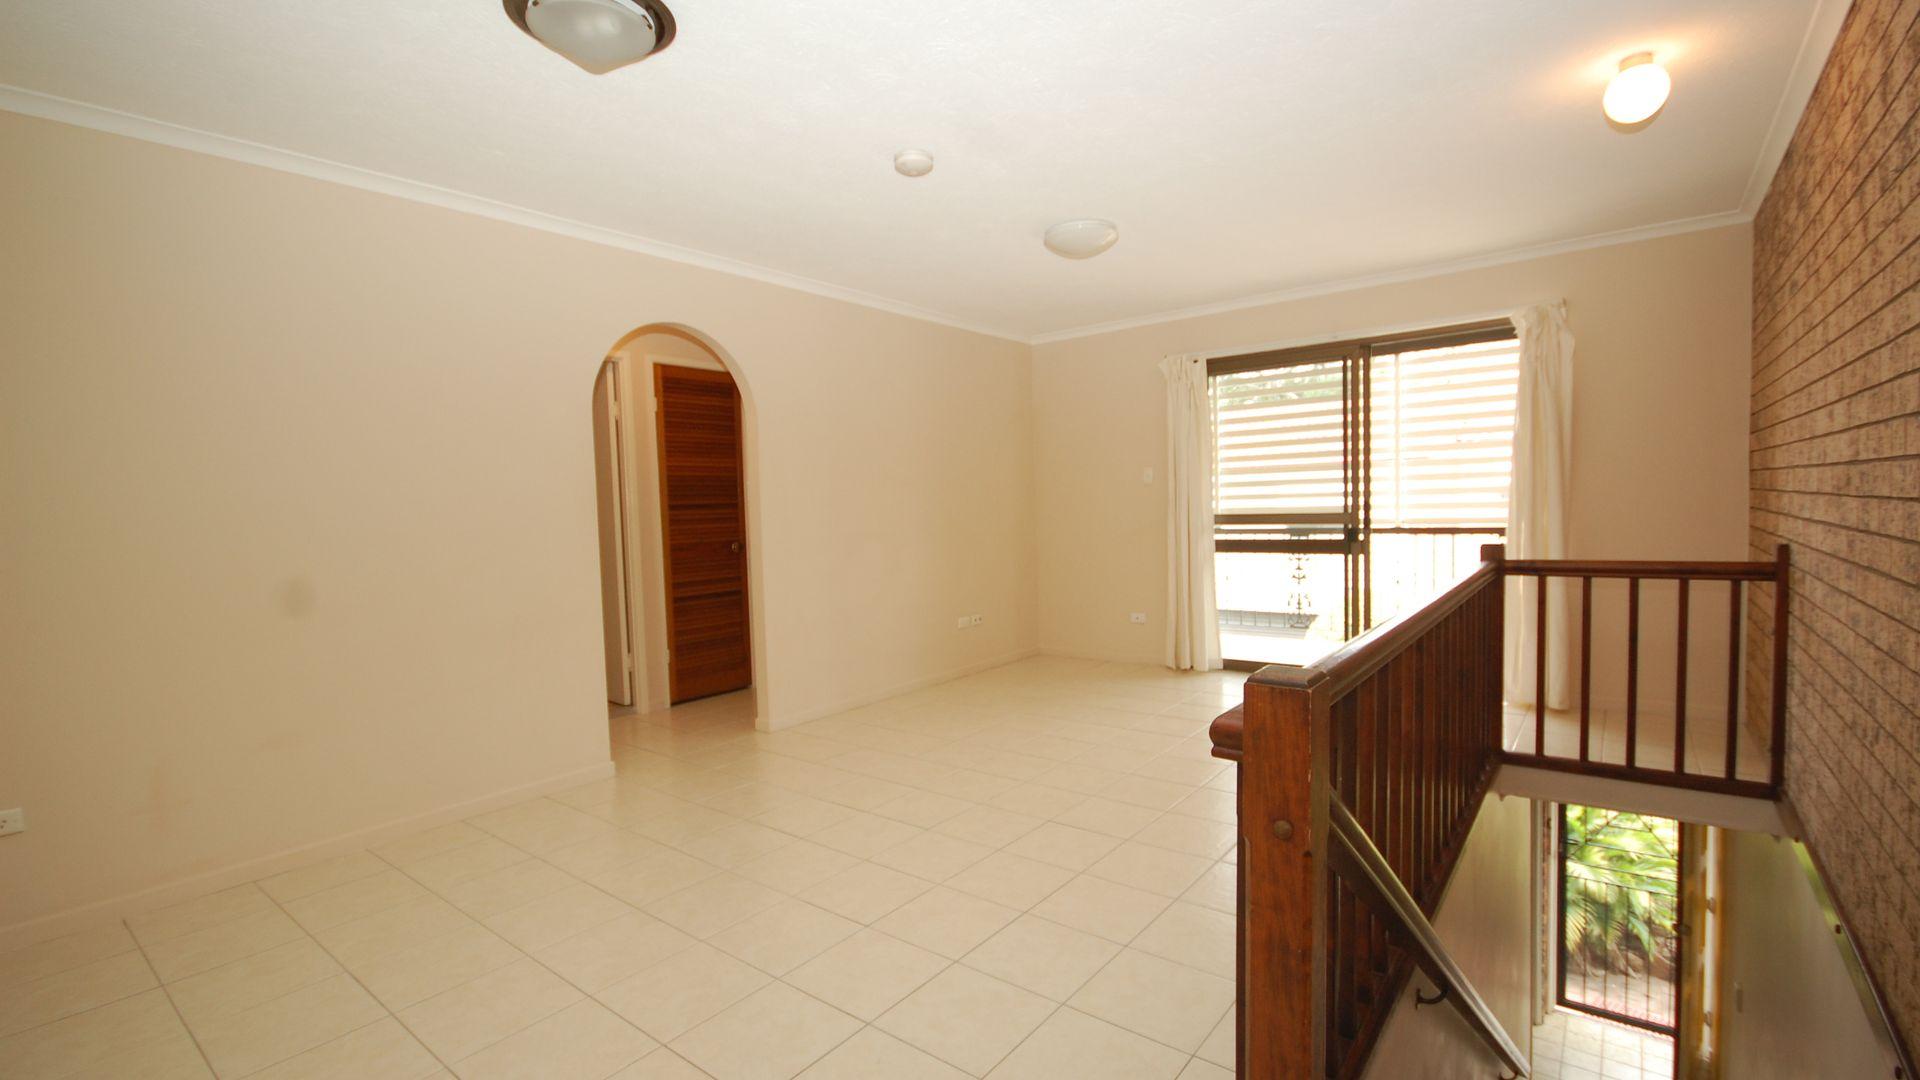 3/90 Invermore Street, Mount Gravatt QLD 4122, Image 2